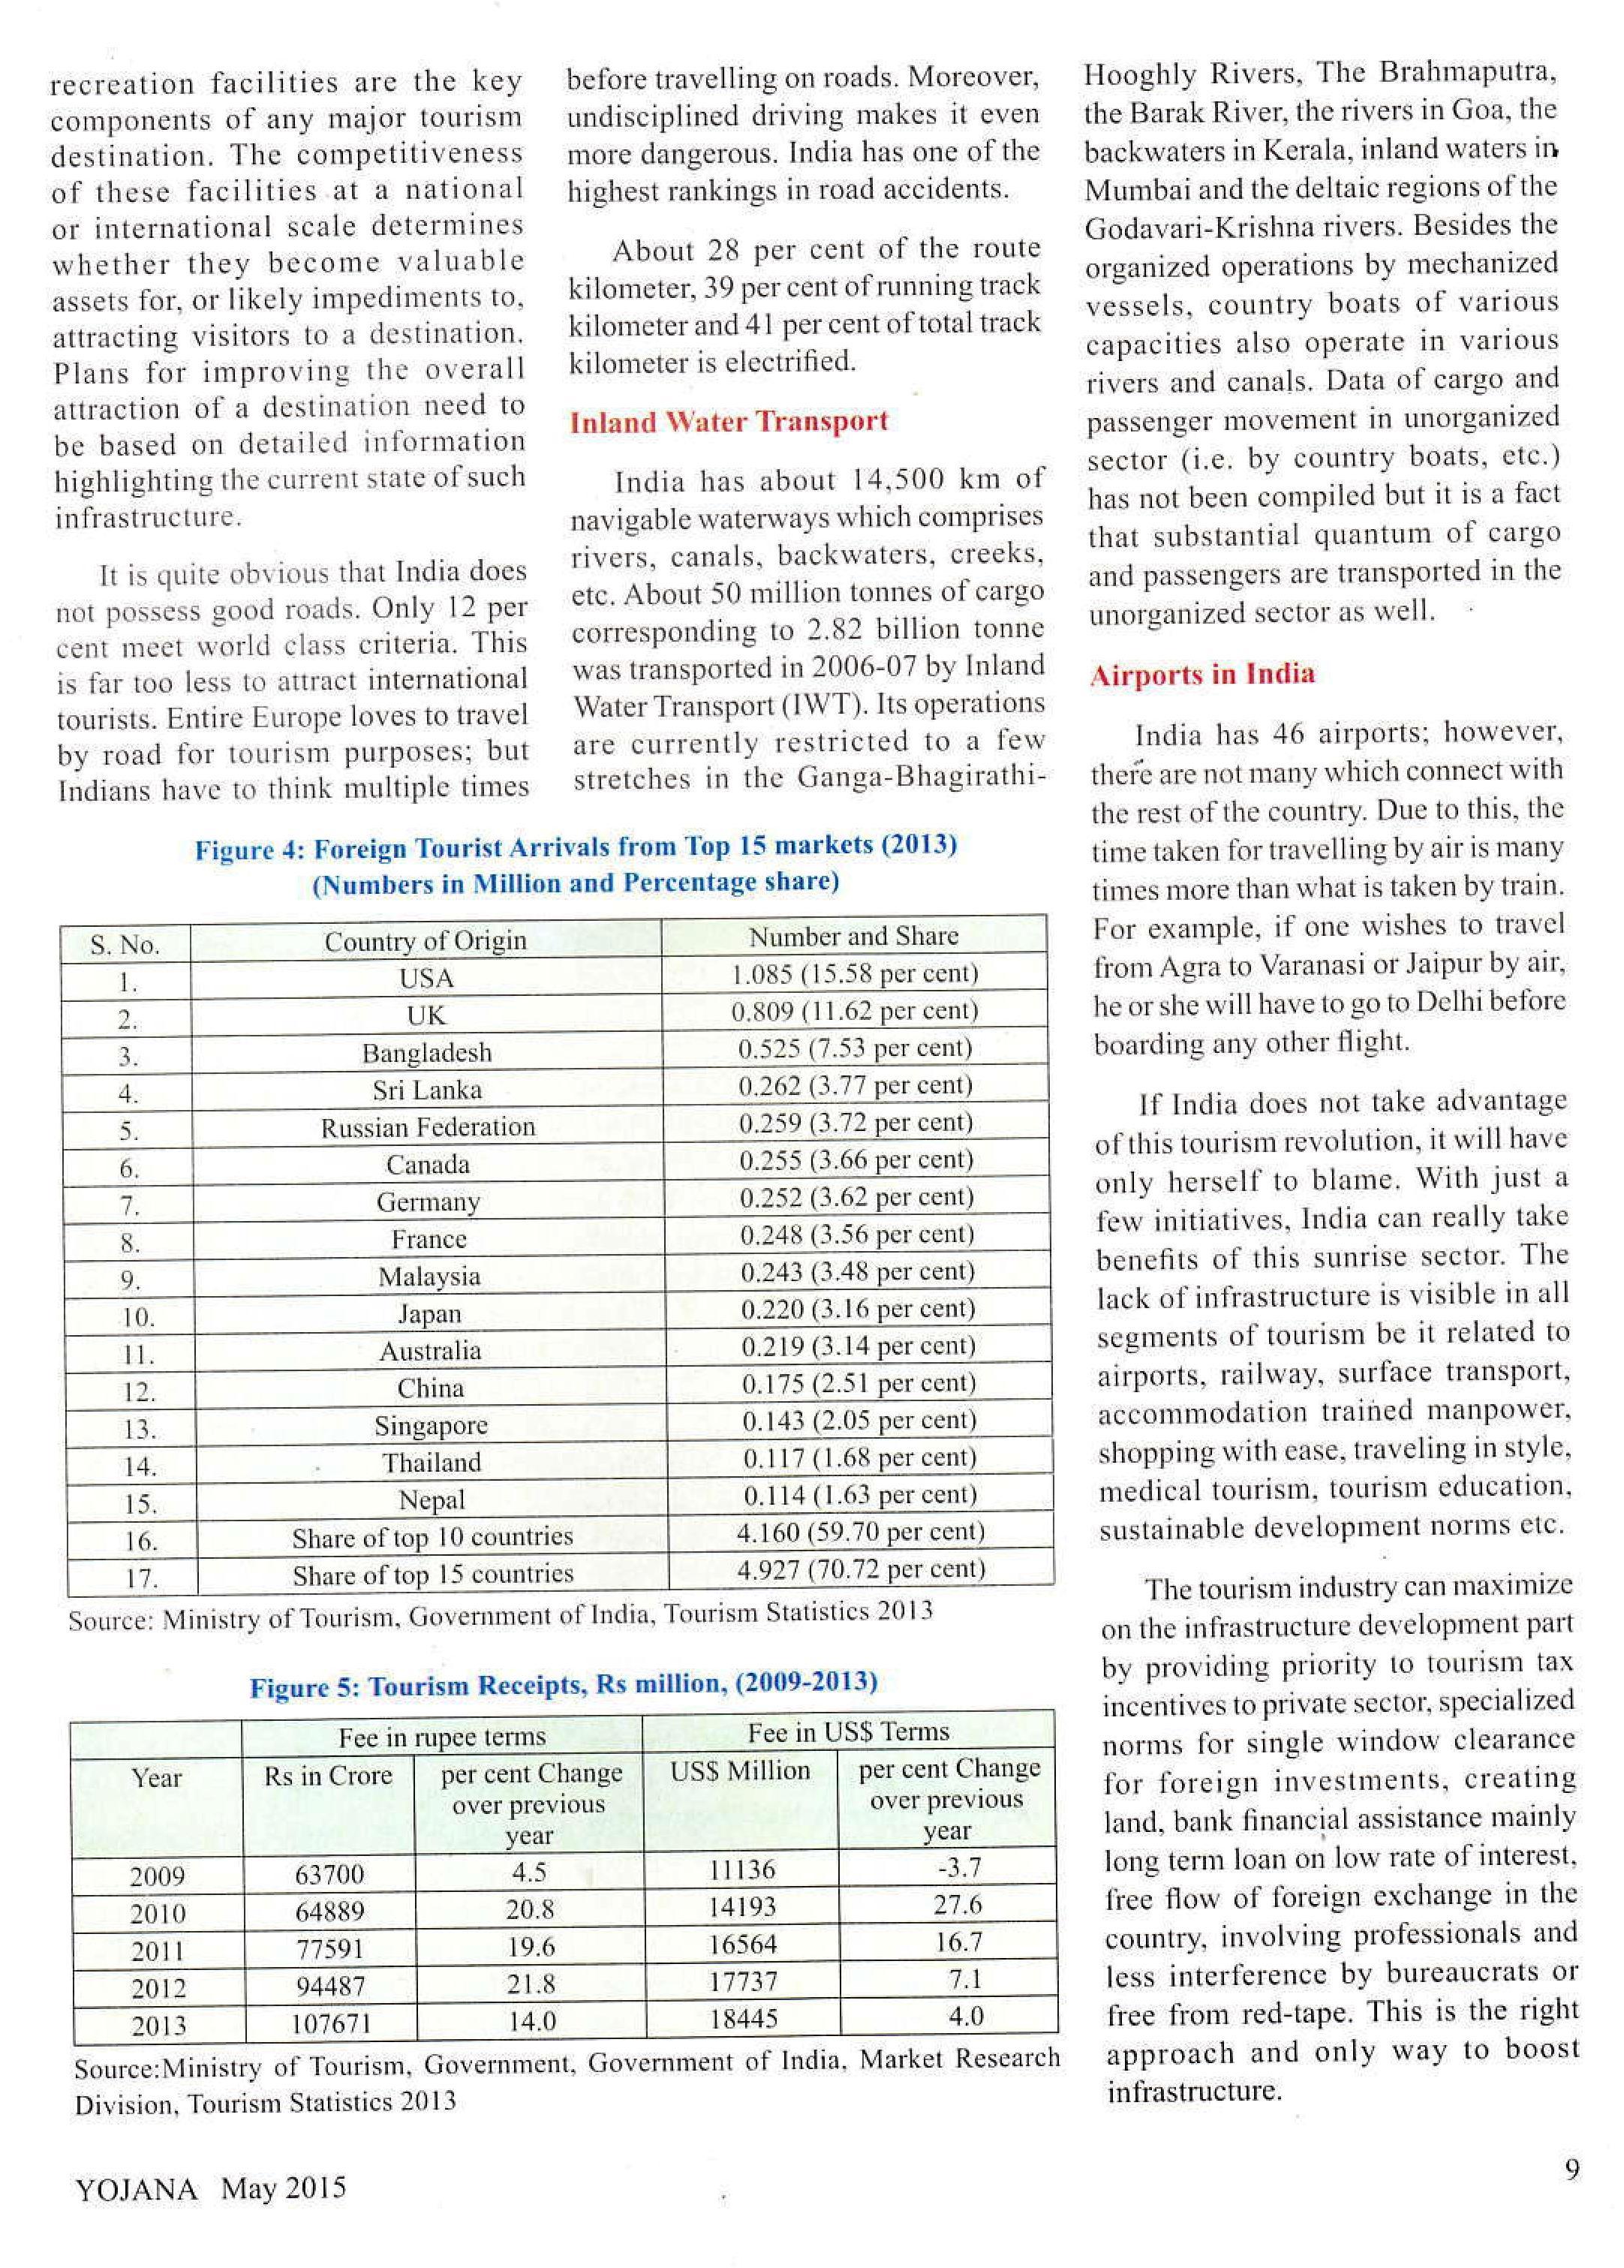 How to read Yojana Magazine for UPSC and Free Download Yojana.